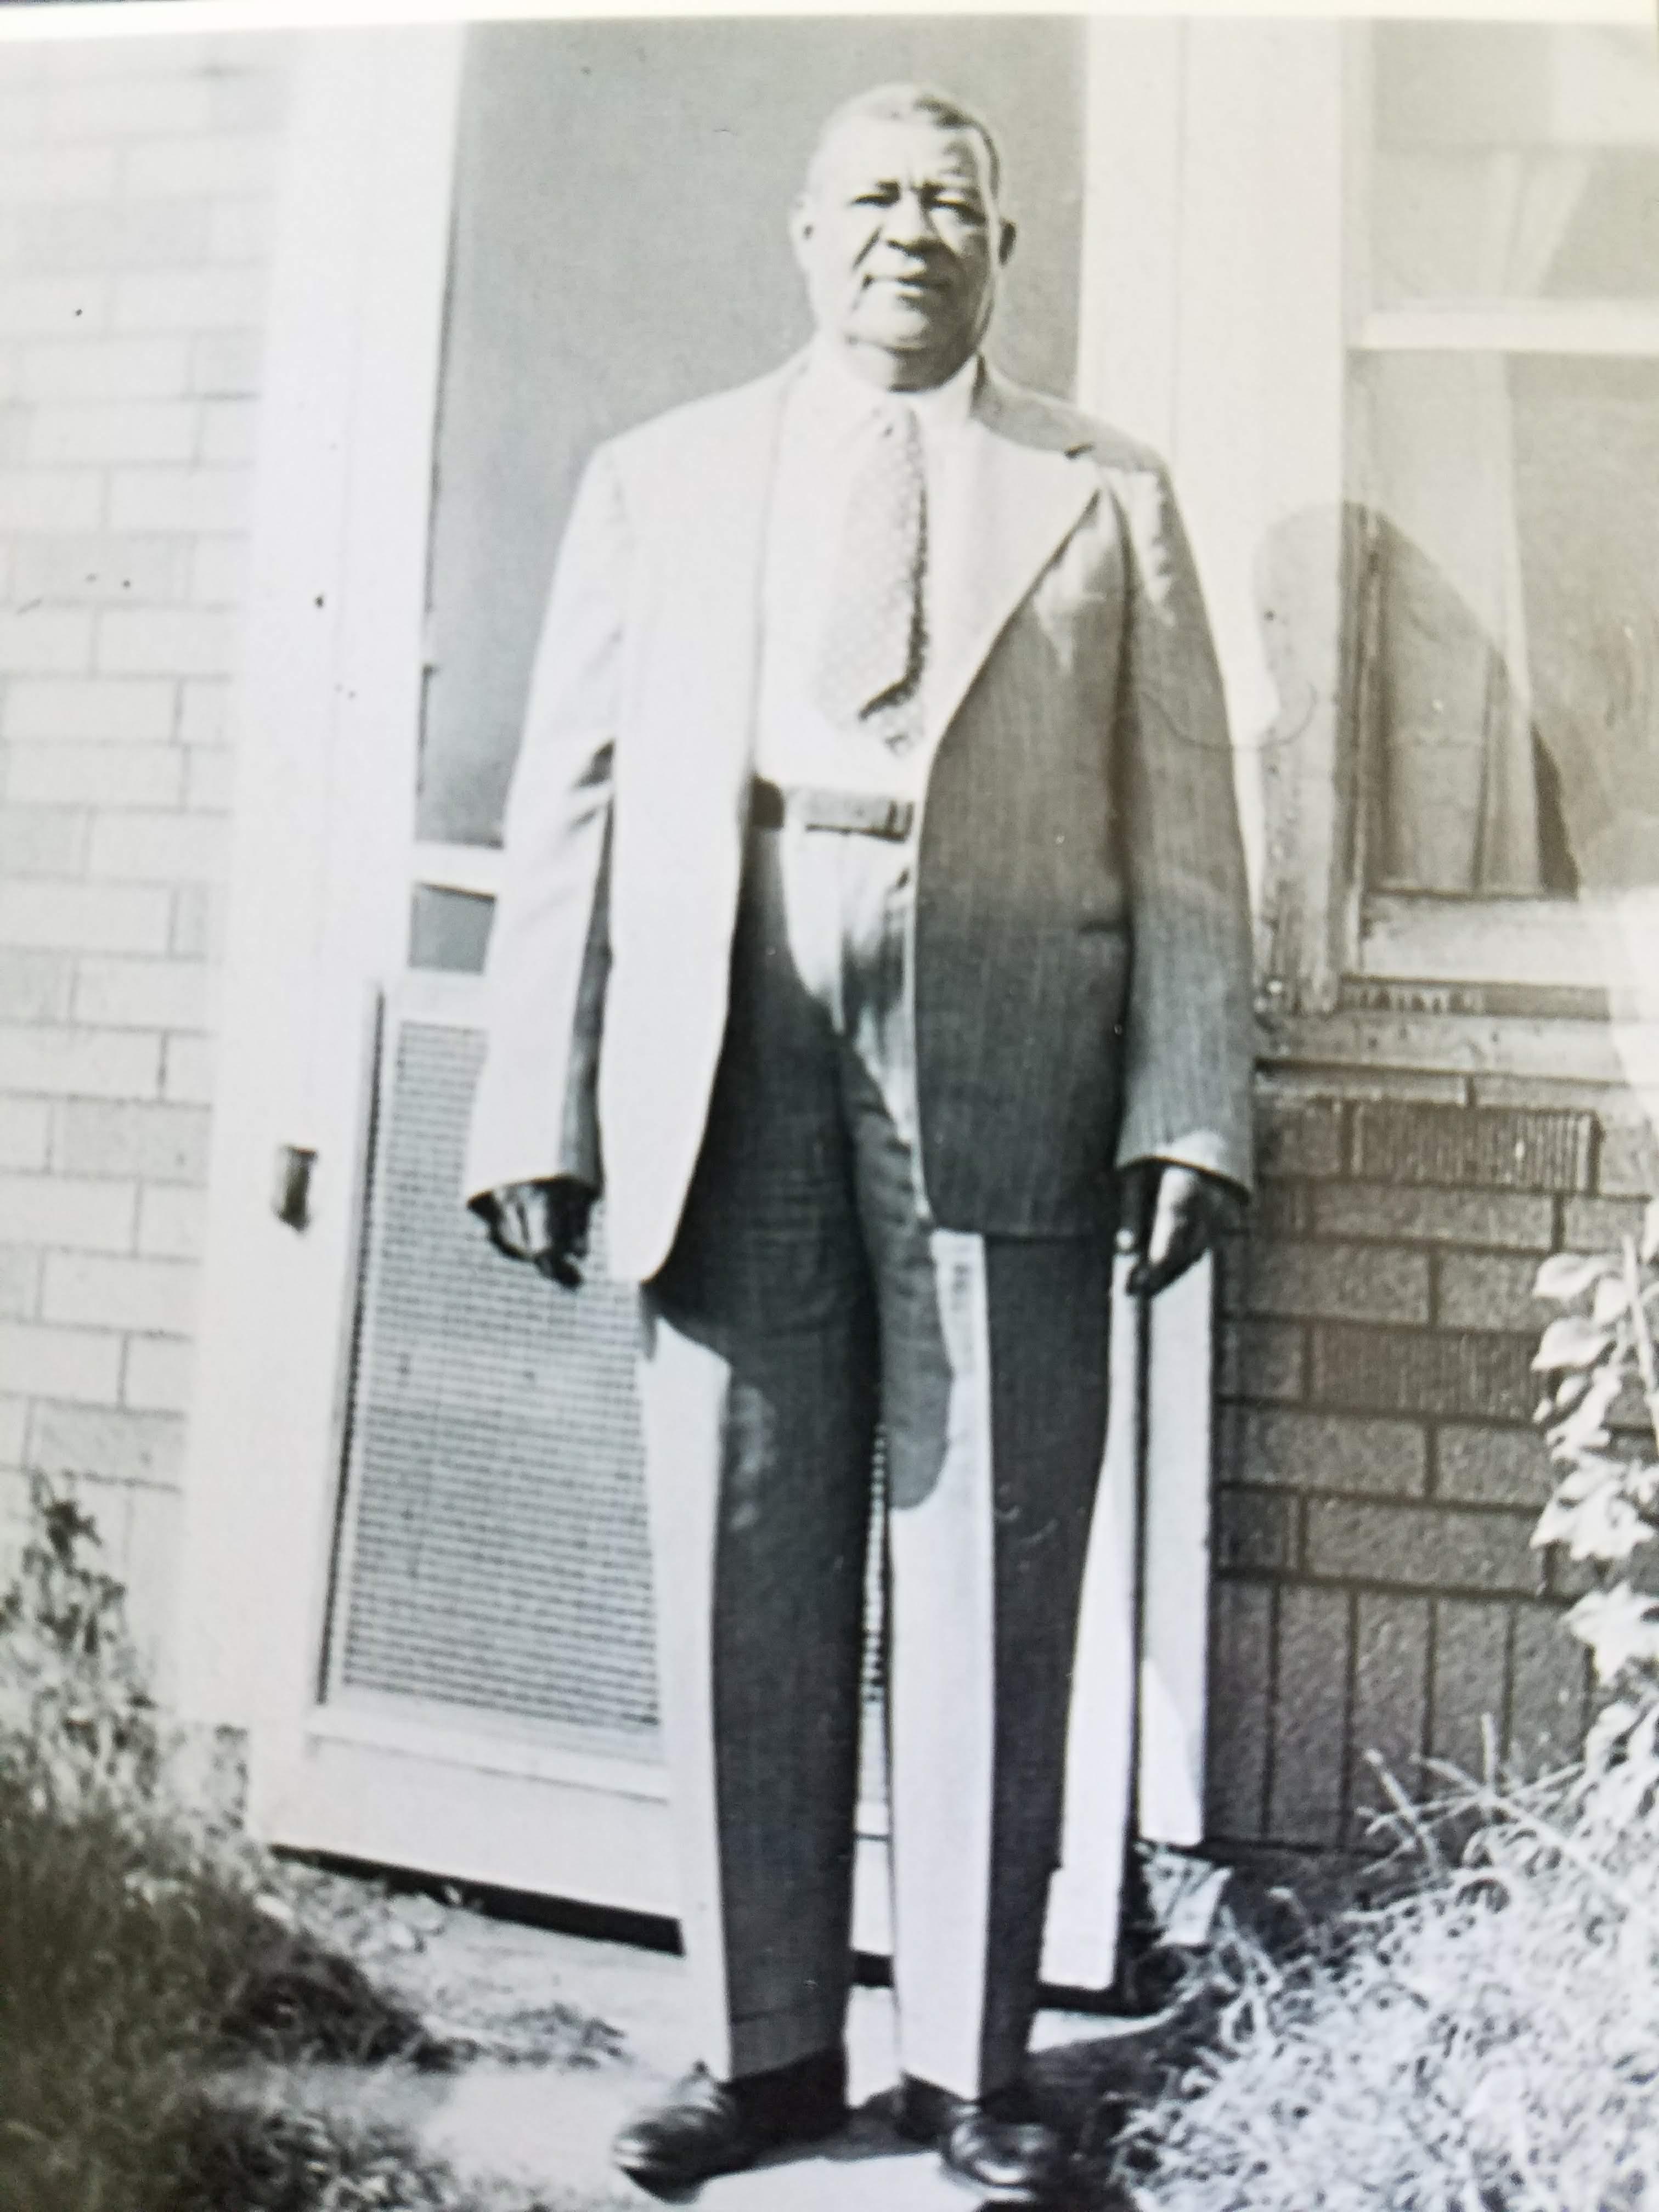 Tonstal Scott - 1950s